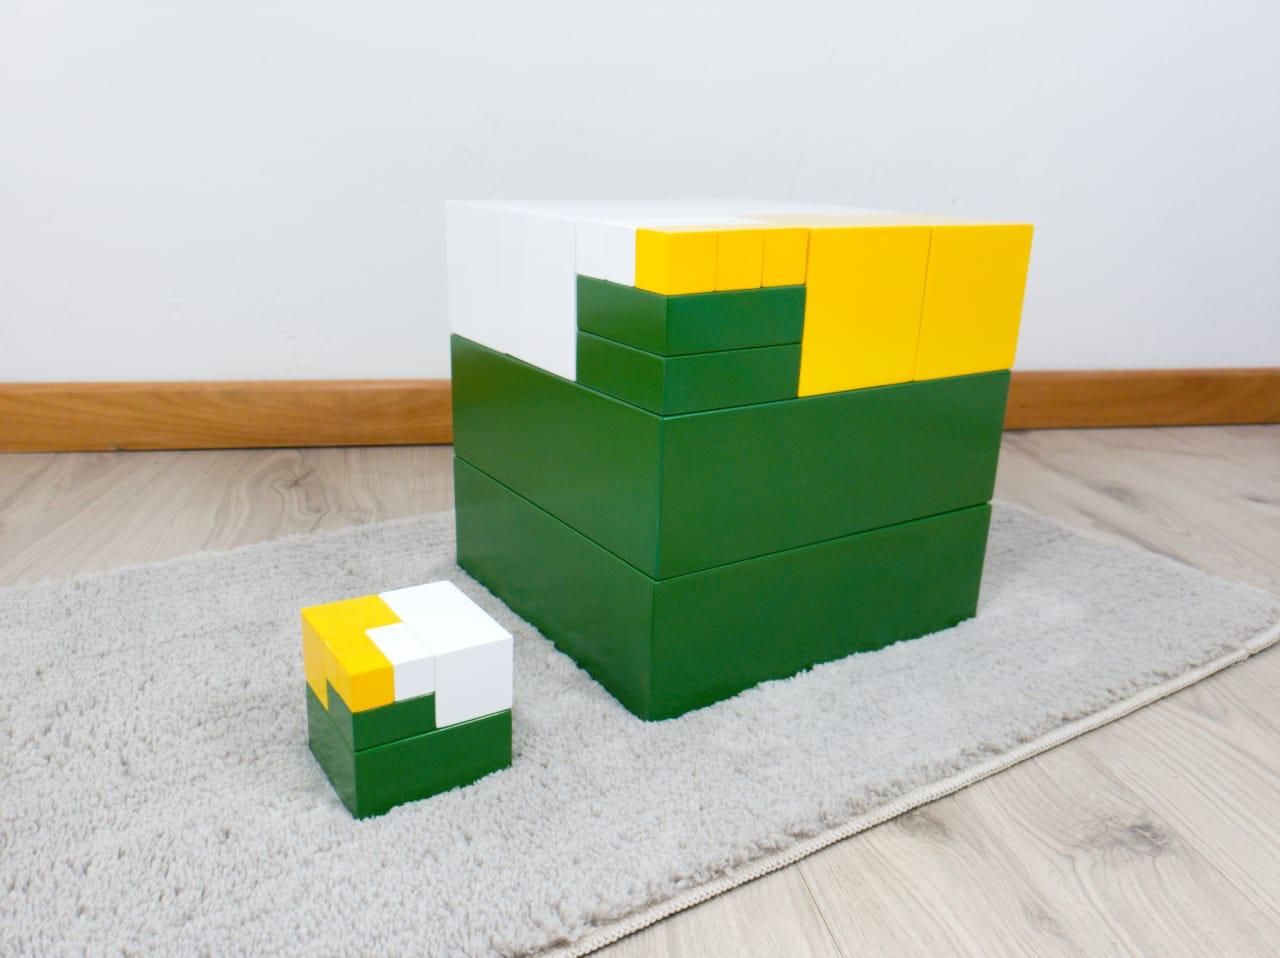 Cubo da Potência do Três